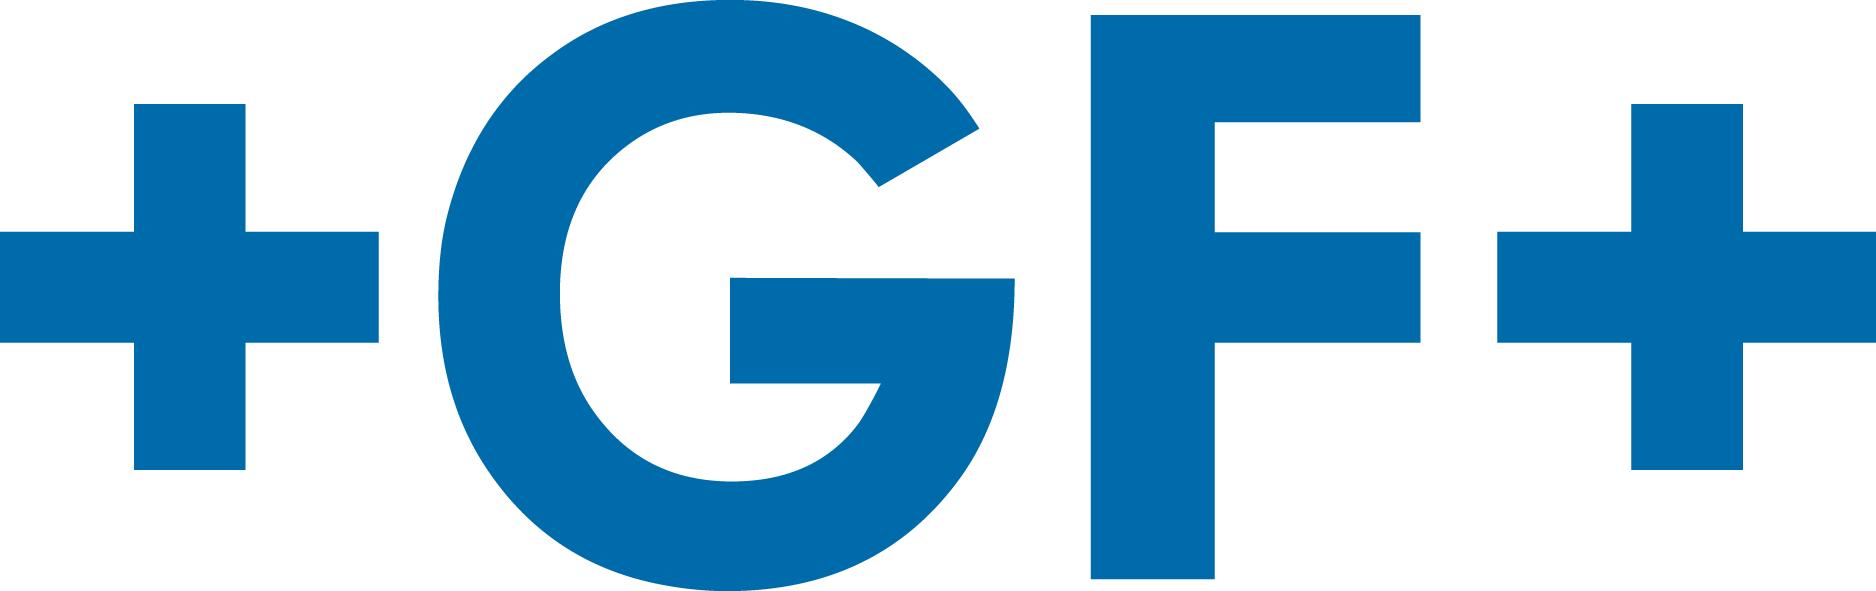 GF Machining Solutions LLC - Irvine